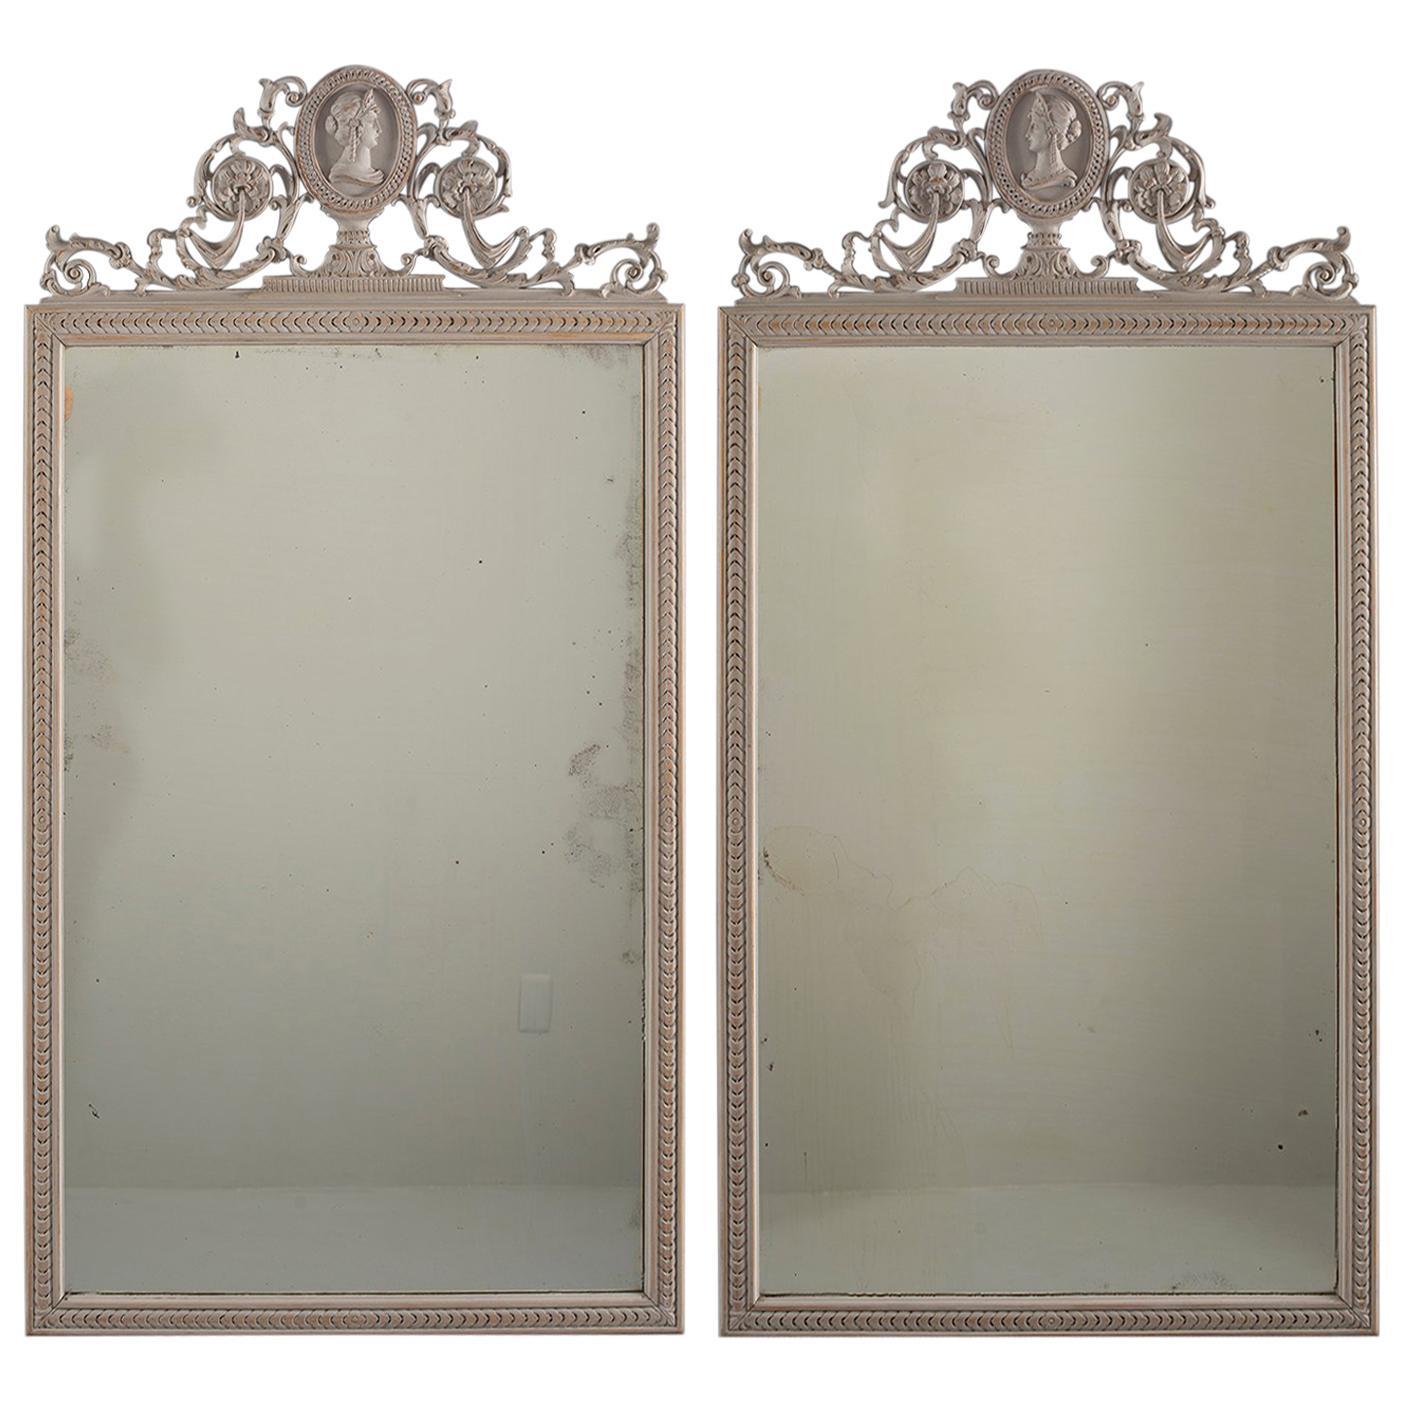 Pair of 19th Century Directoire Mirrors